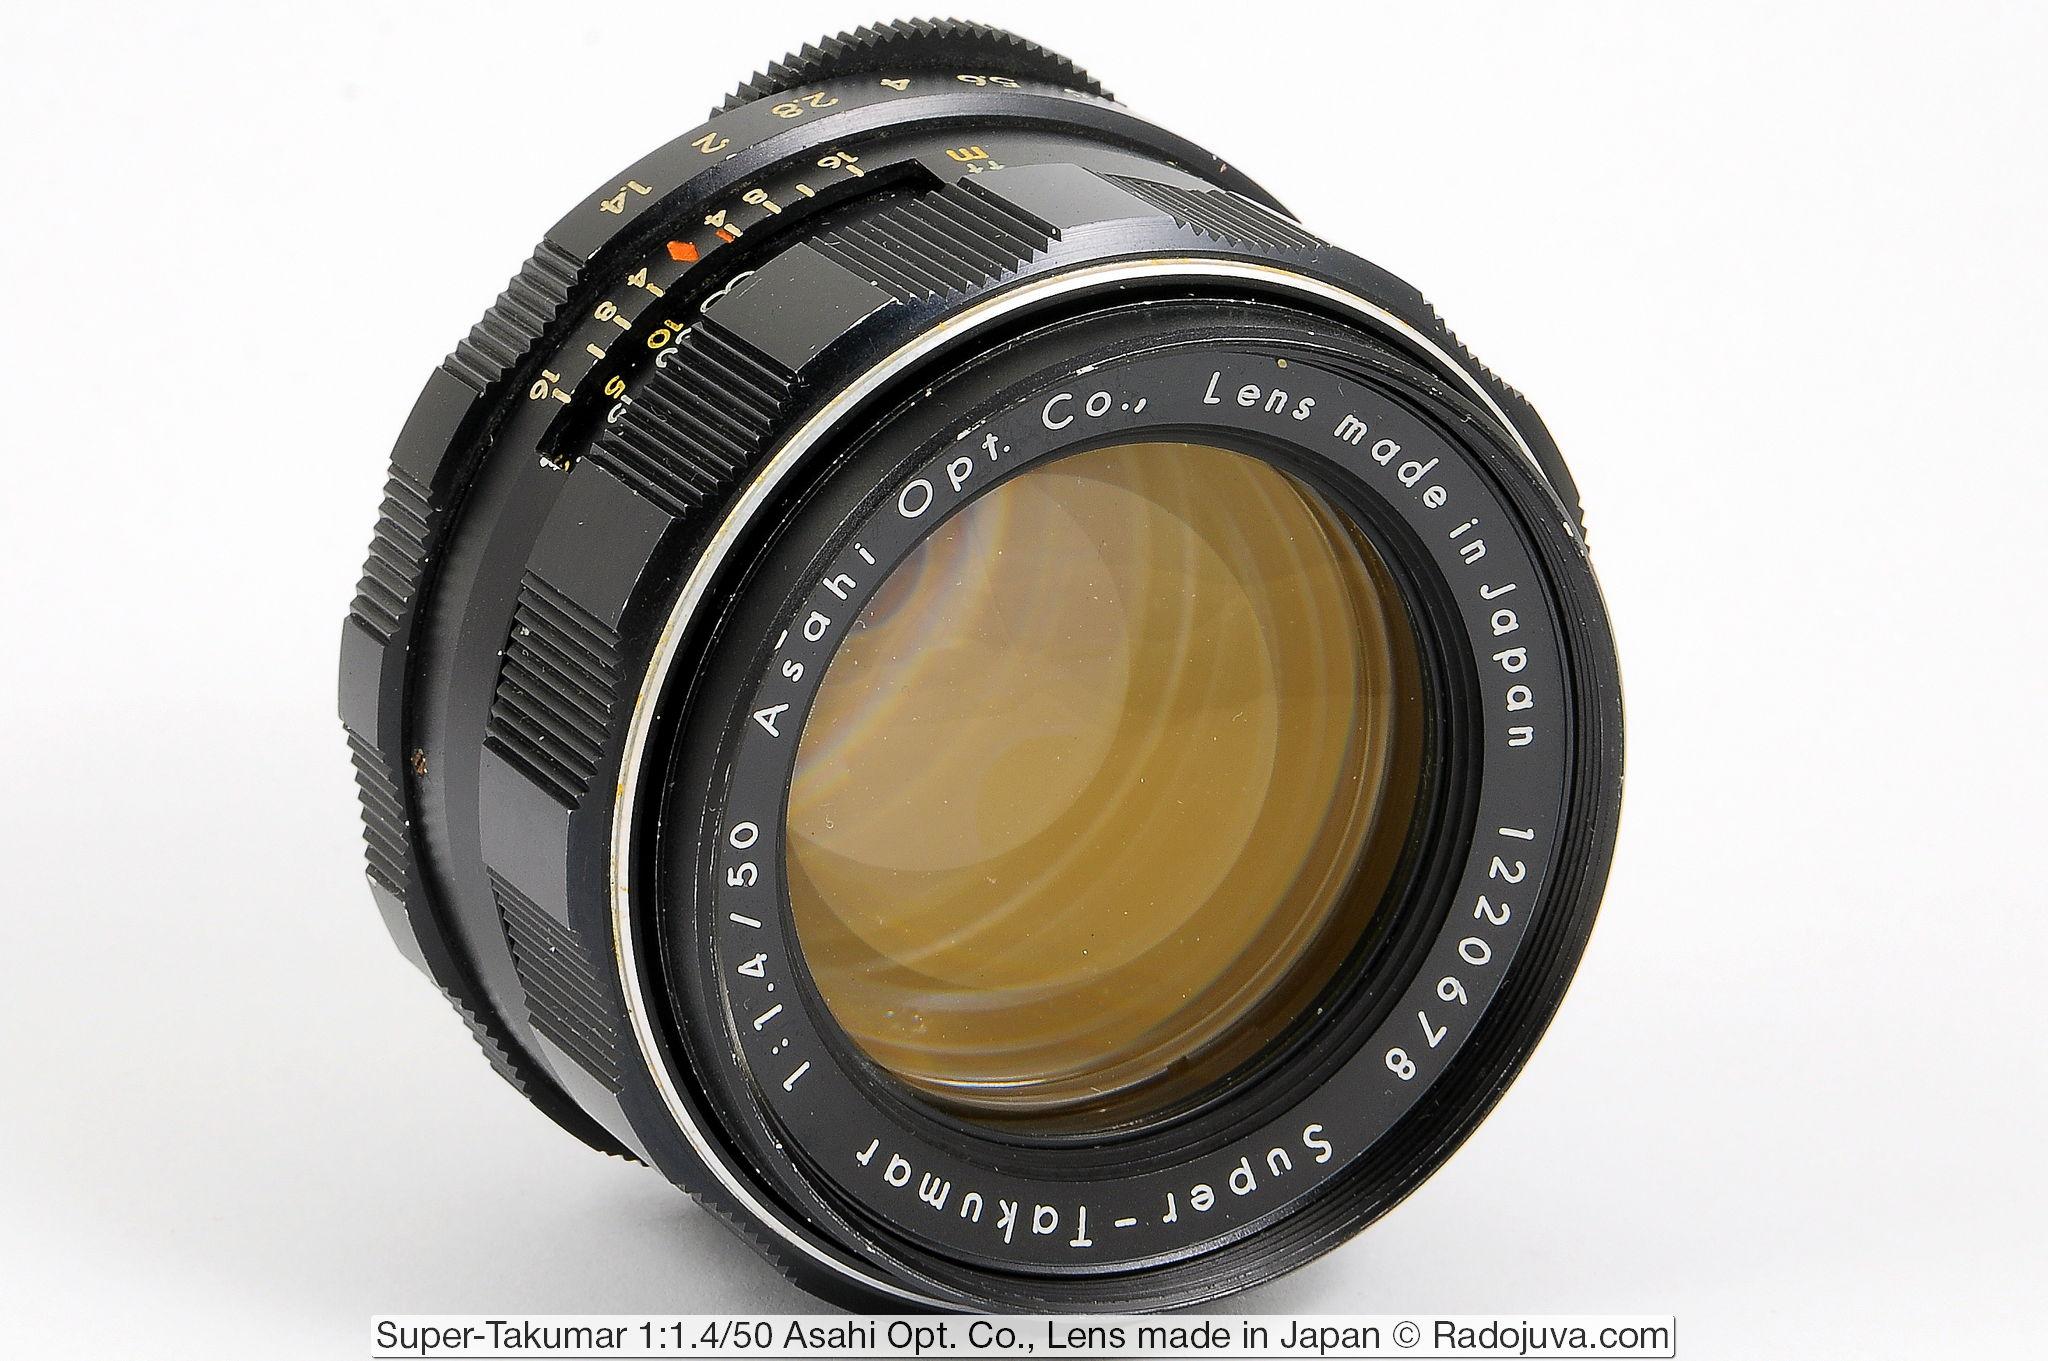 Super-Takumar 1:1.4/50 Asahi Opt. Co., Lens made in Japan